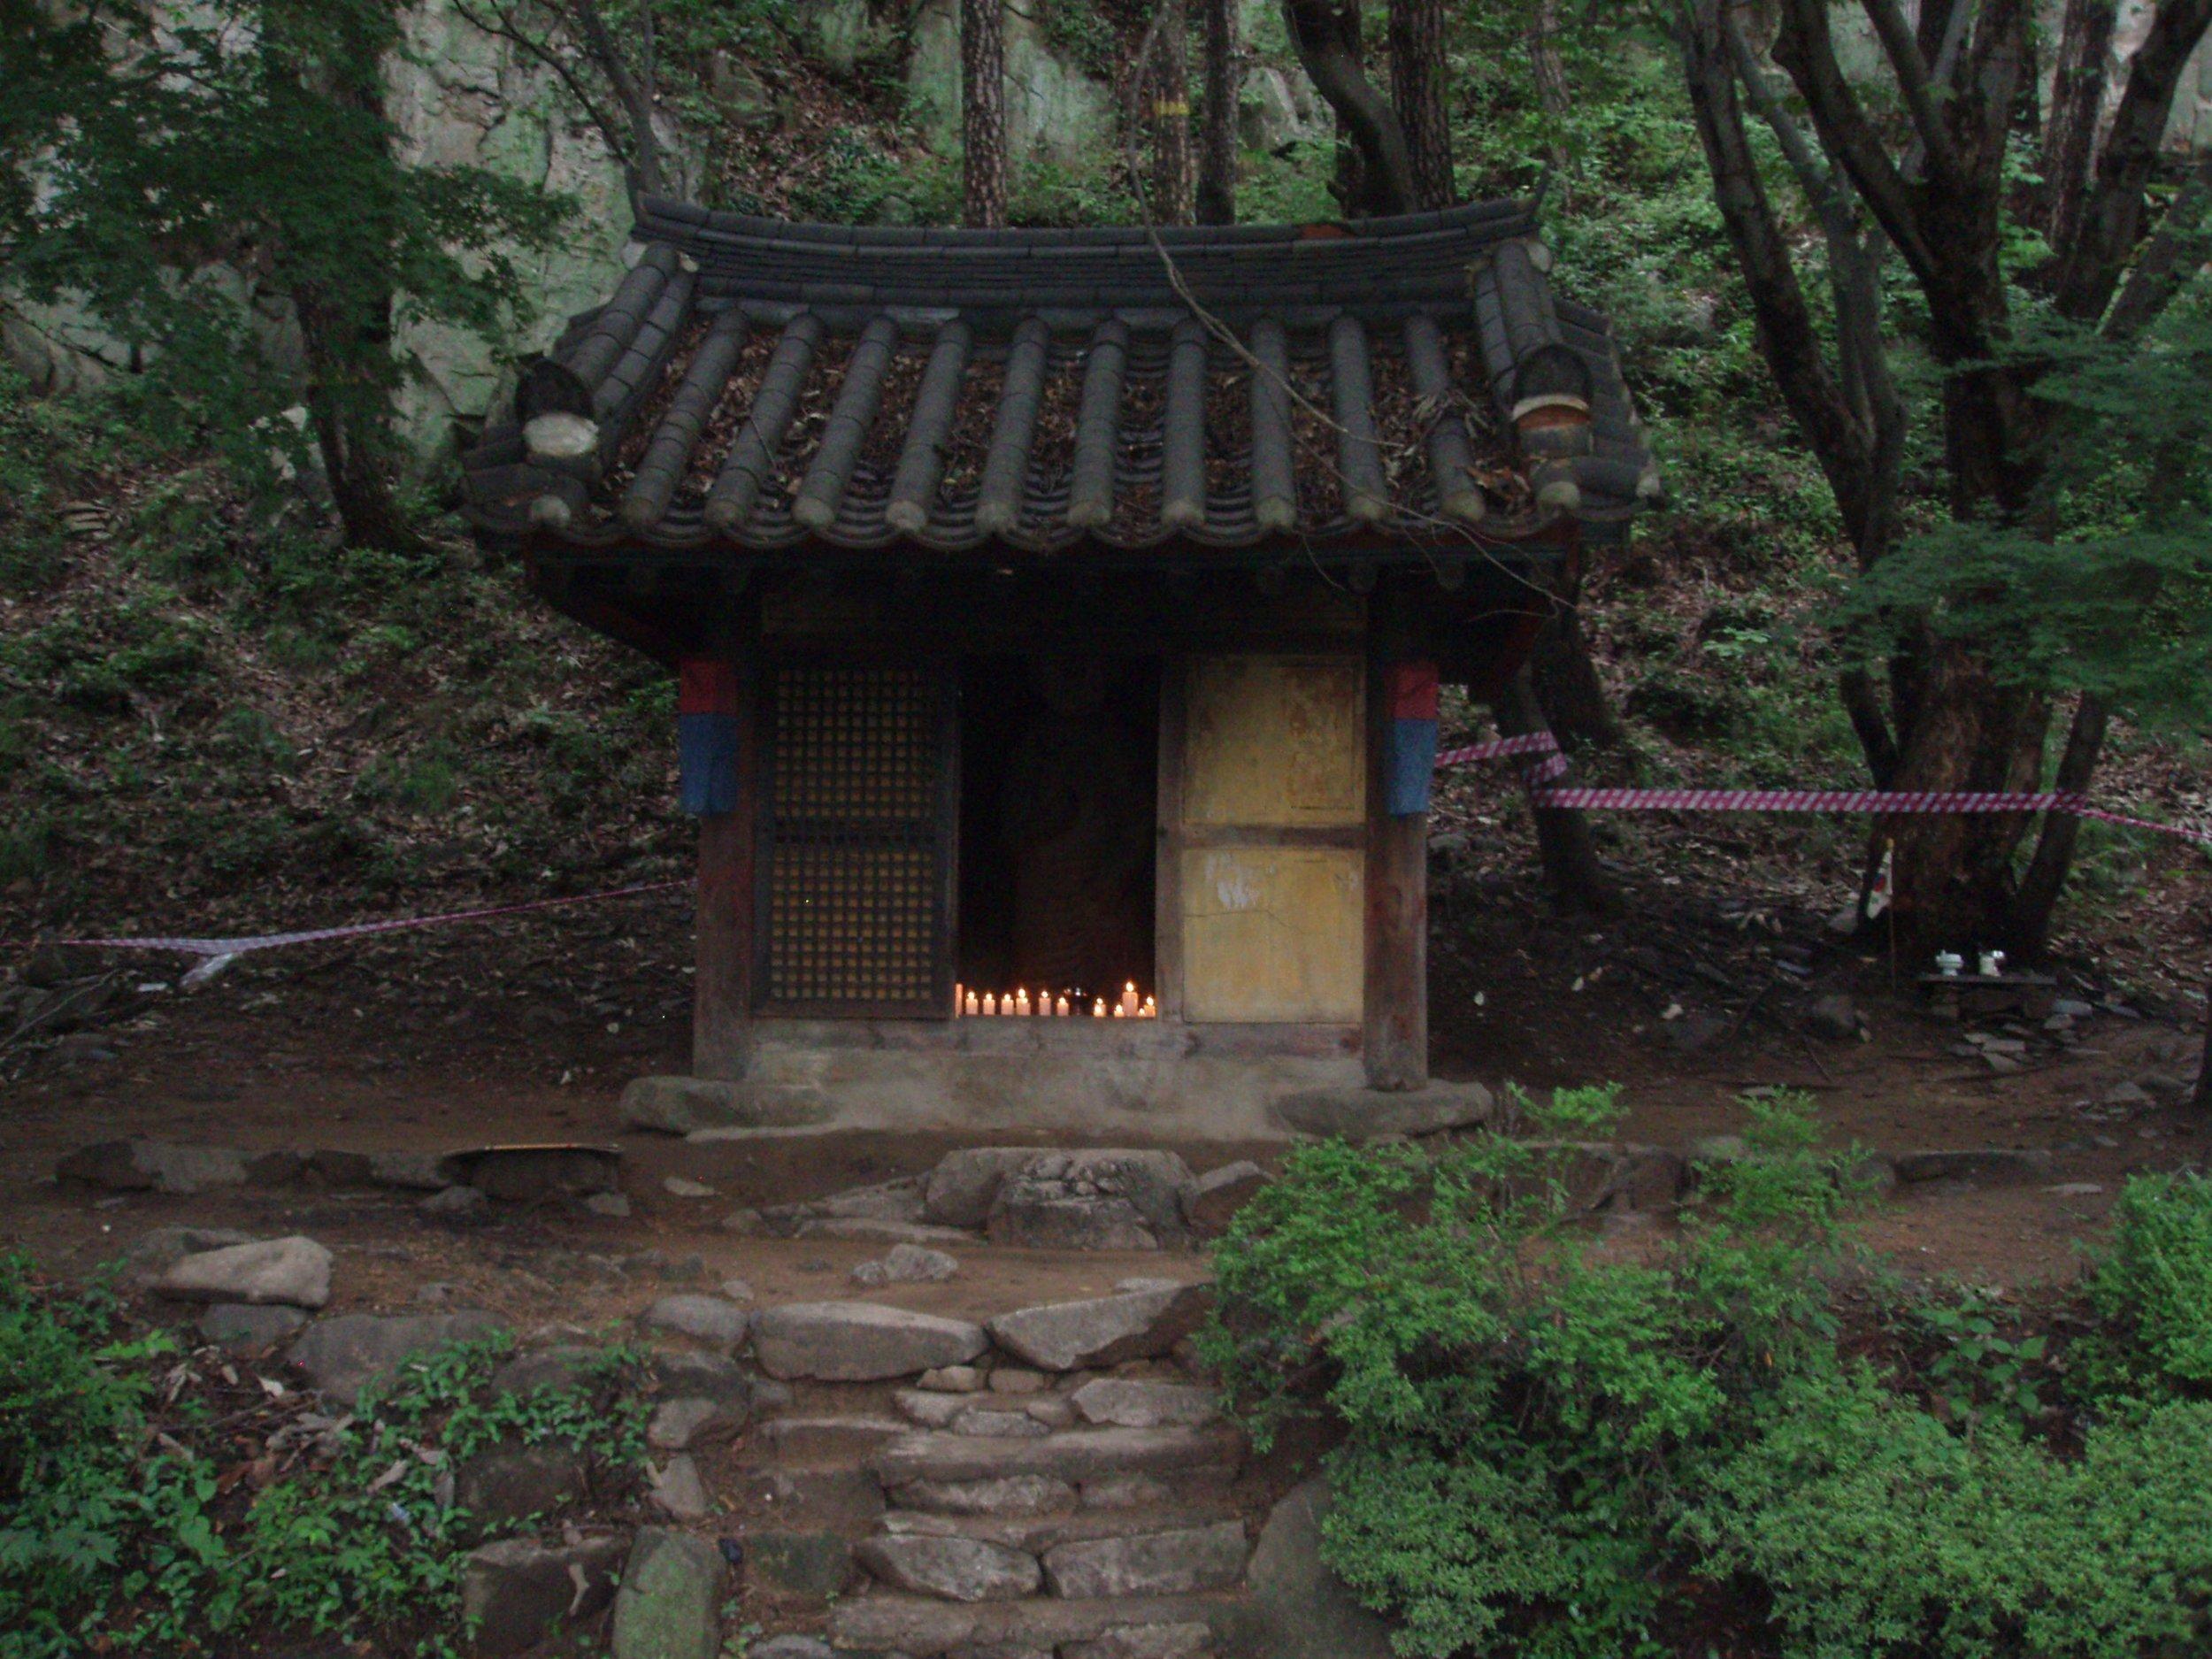 Shrine-with-Candles-at-Keunmsan.jpg